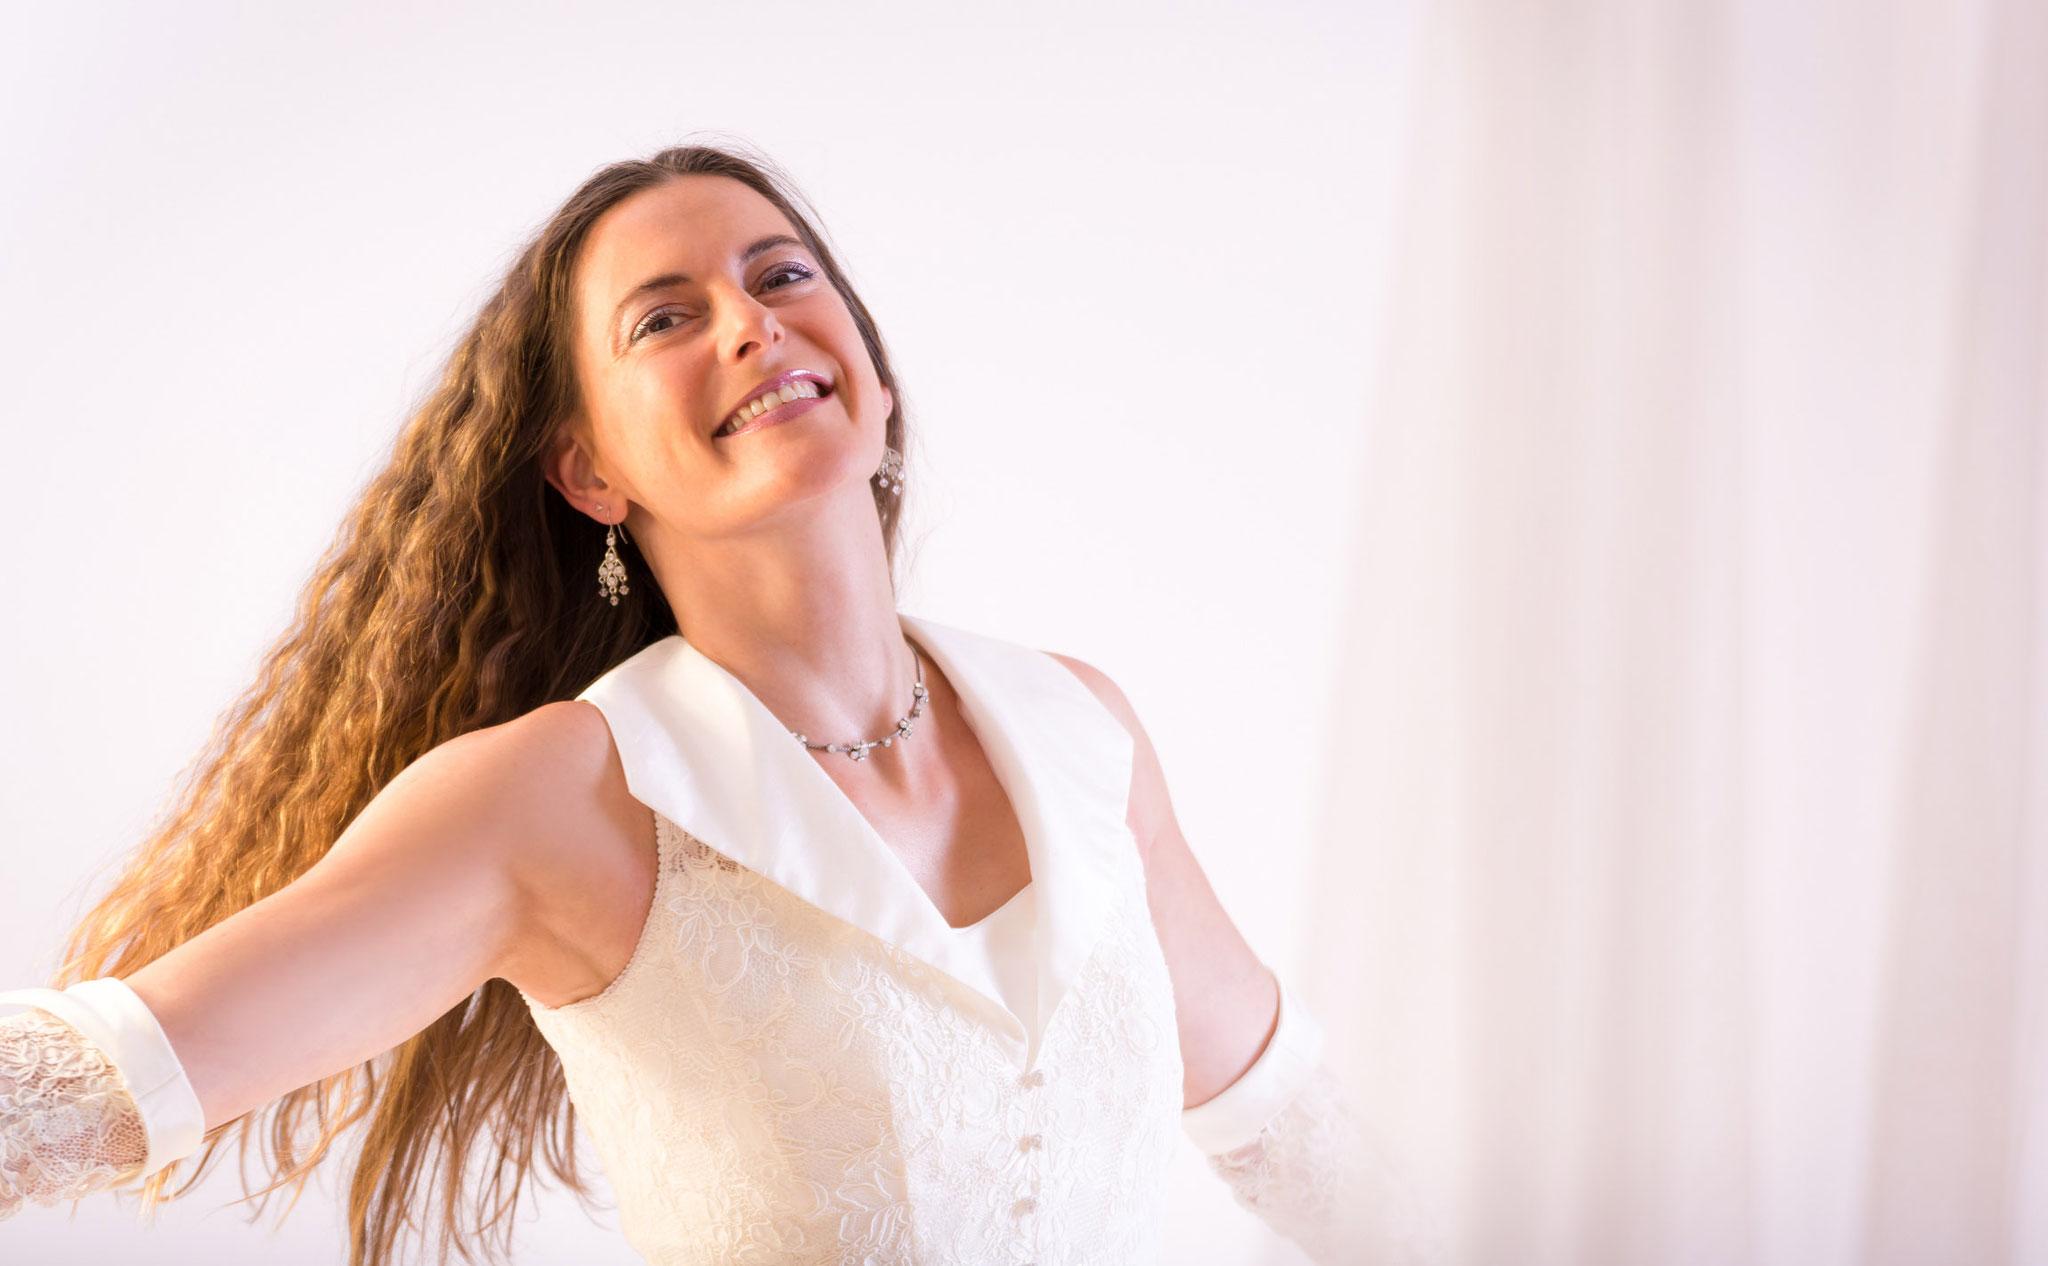 Fotos mit Freude bietet exklusive Braut Fotoshootings